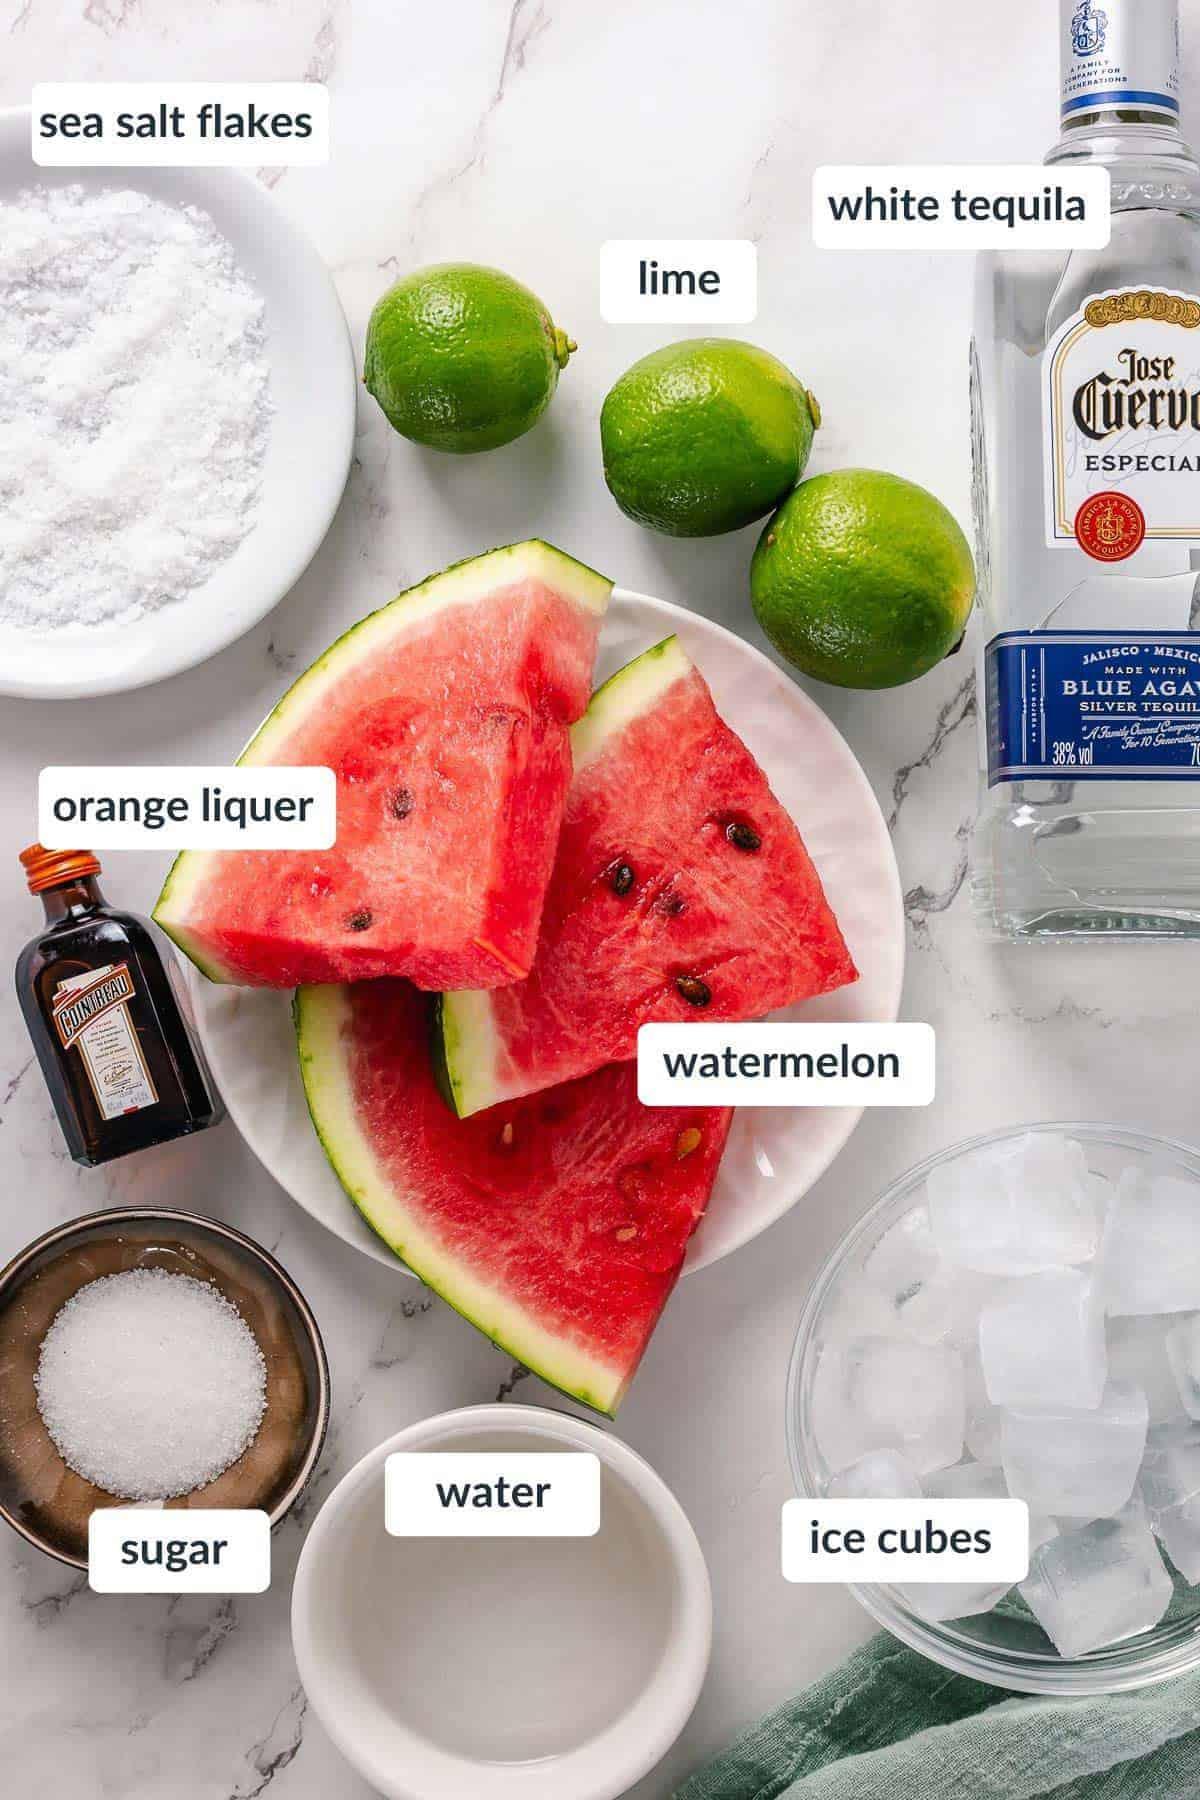 Skinny Watermelon Margarita ingredients flat lay shot